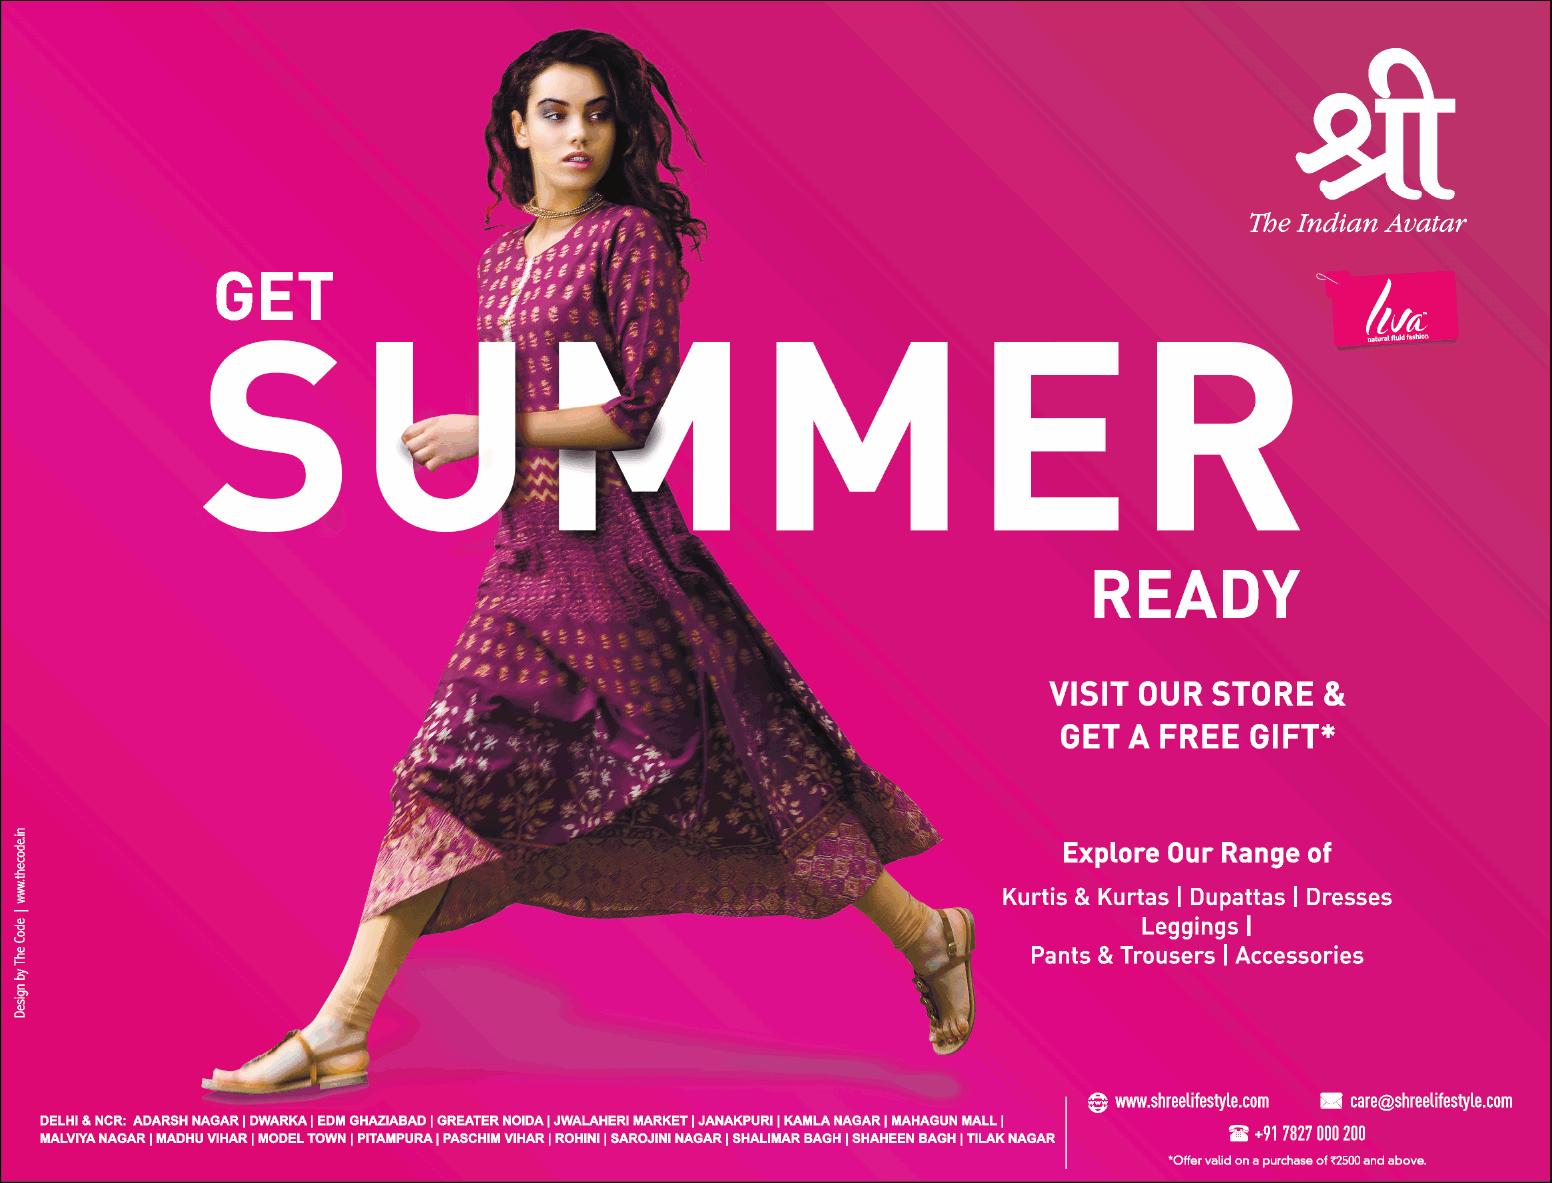 fc10e1258e Shree The Indian Avatar Get Summer Ready Ad - Advert Gallery